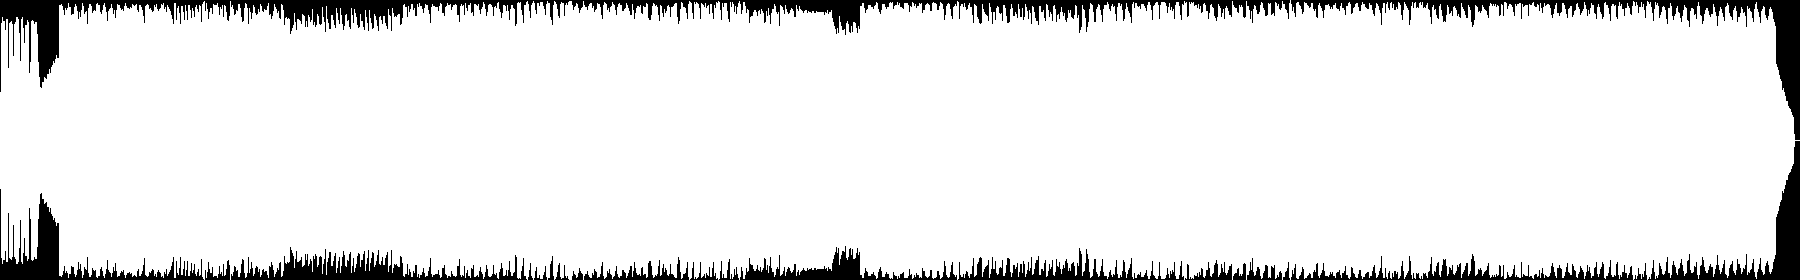 Synth Shotz audio waveform